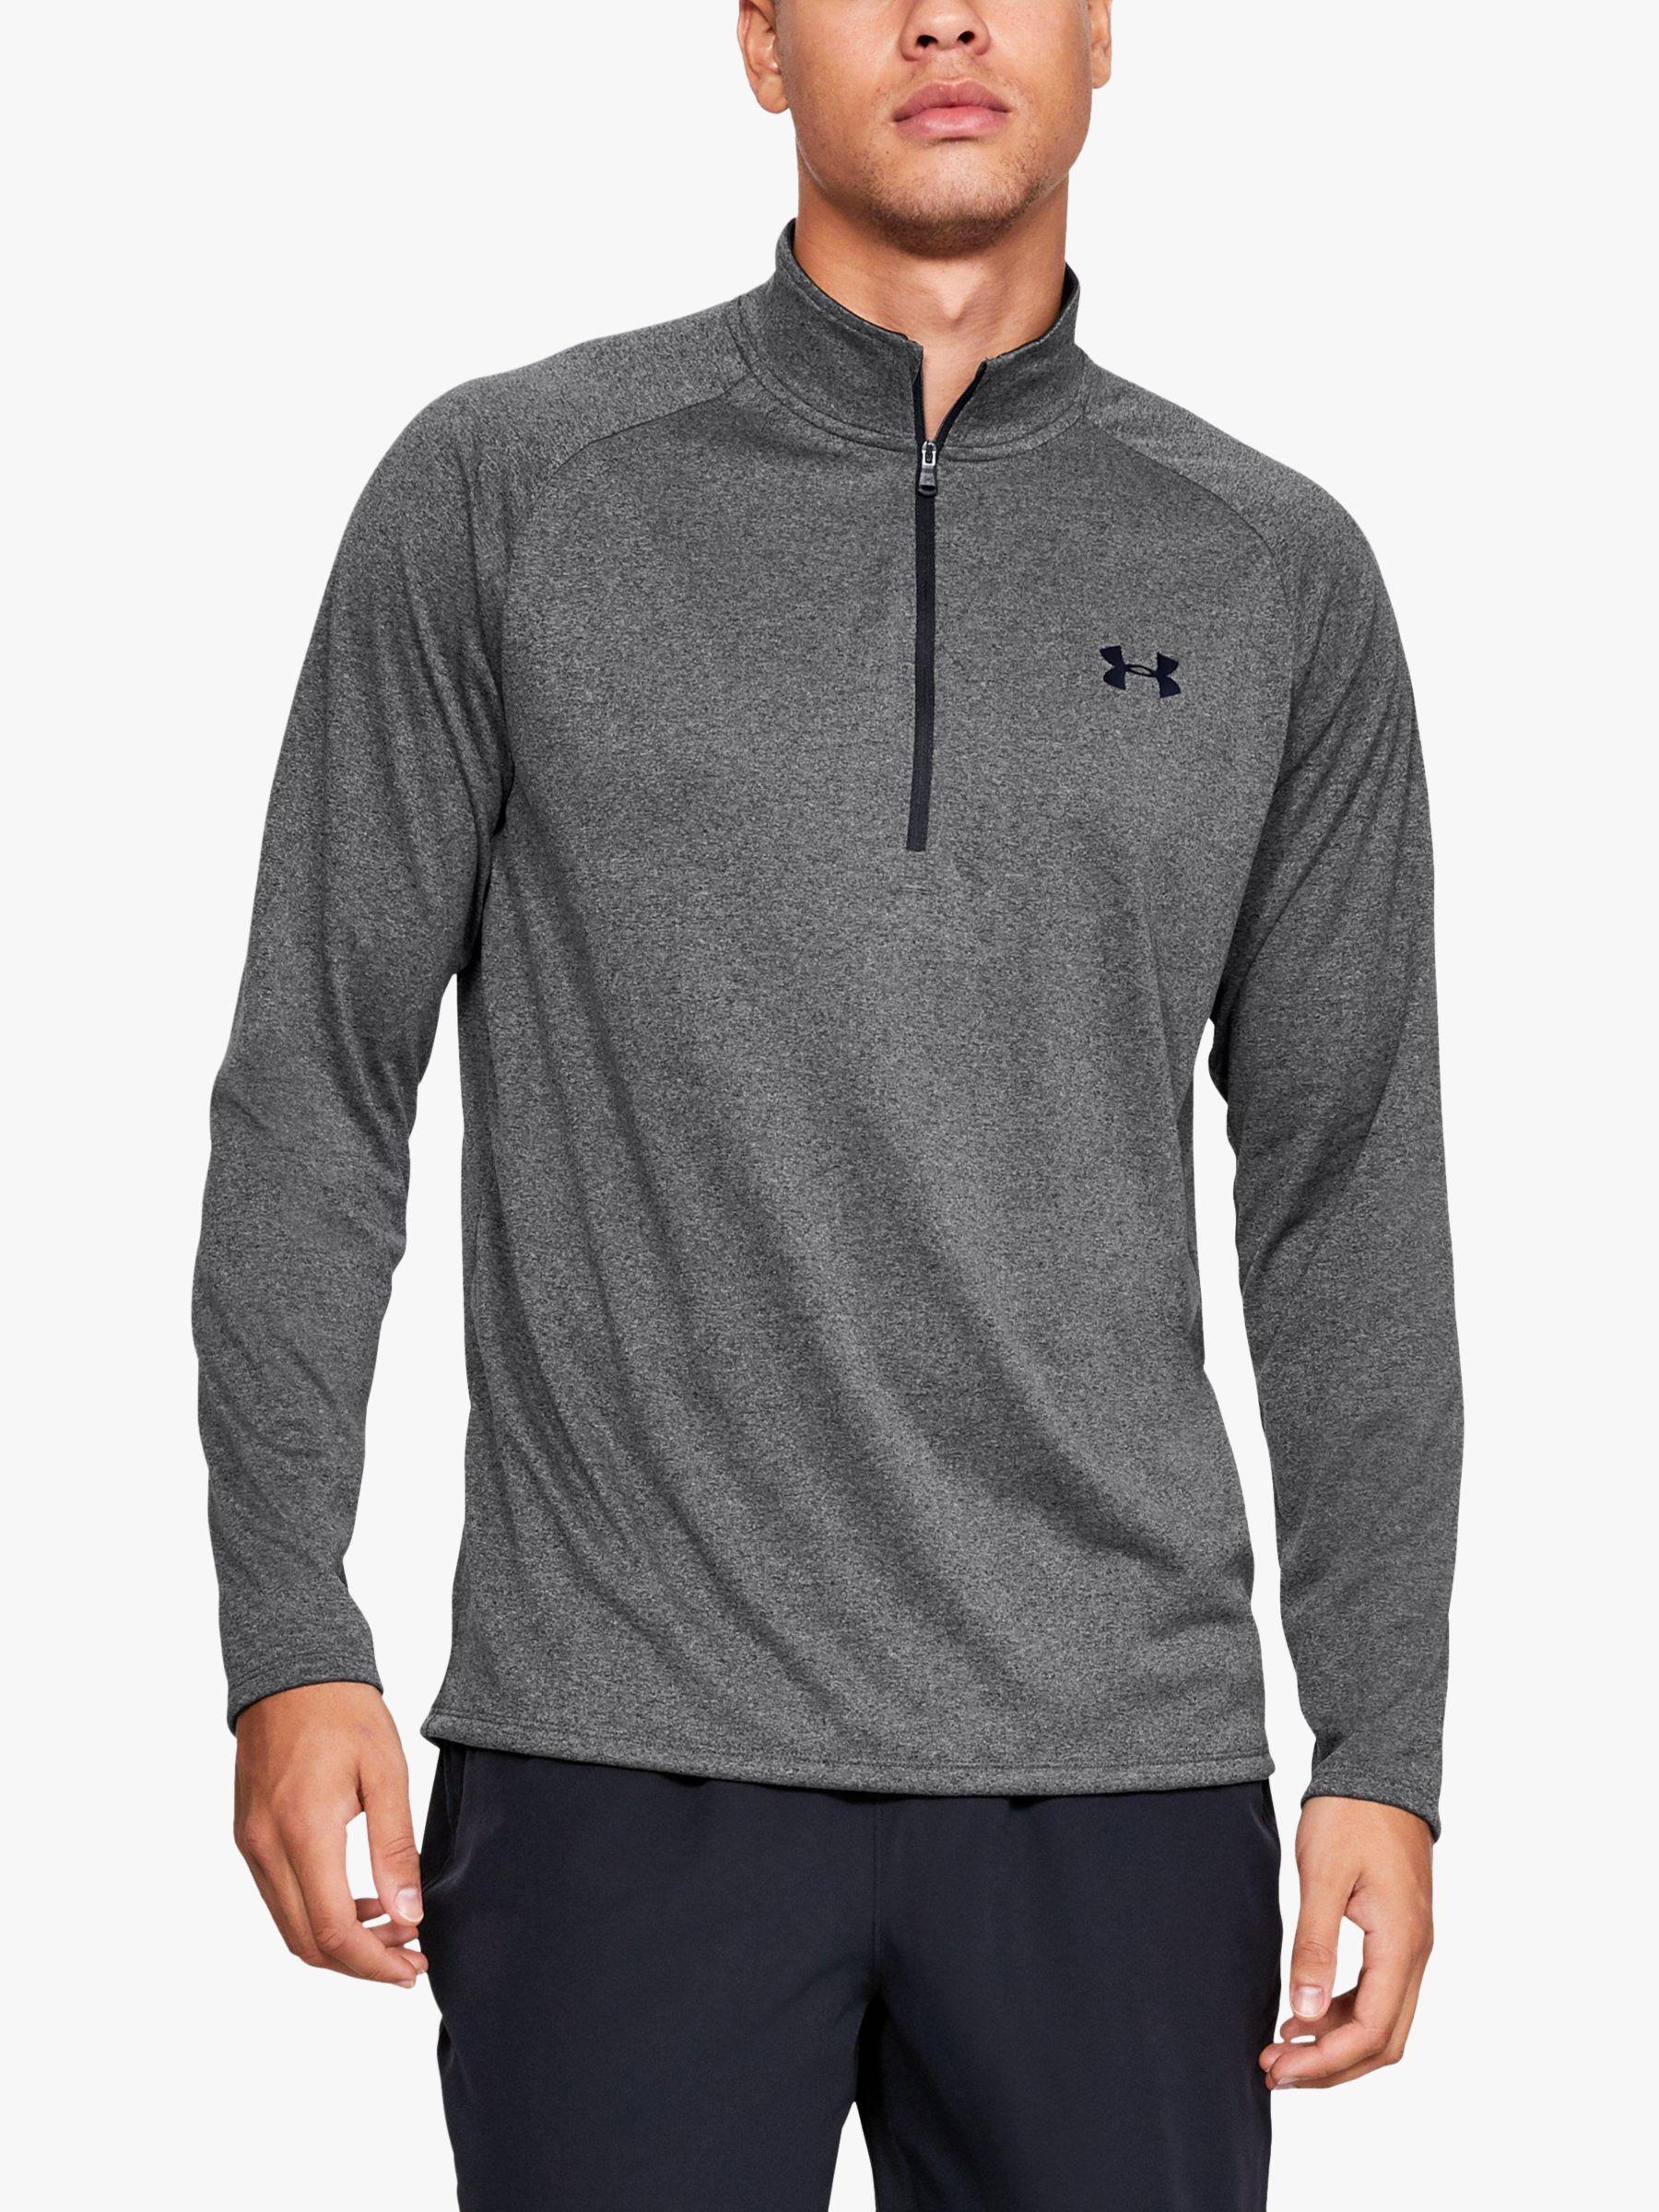 Grey Under Armour Half Zip Mens Long Sleeve Training Top